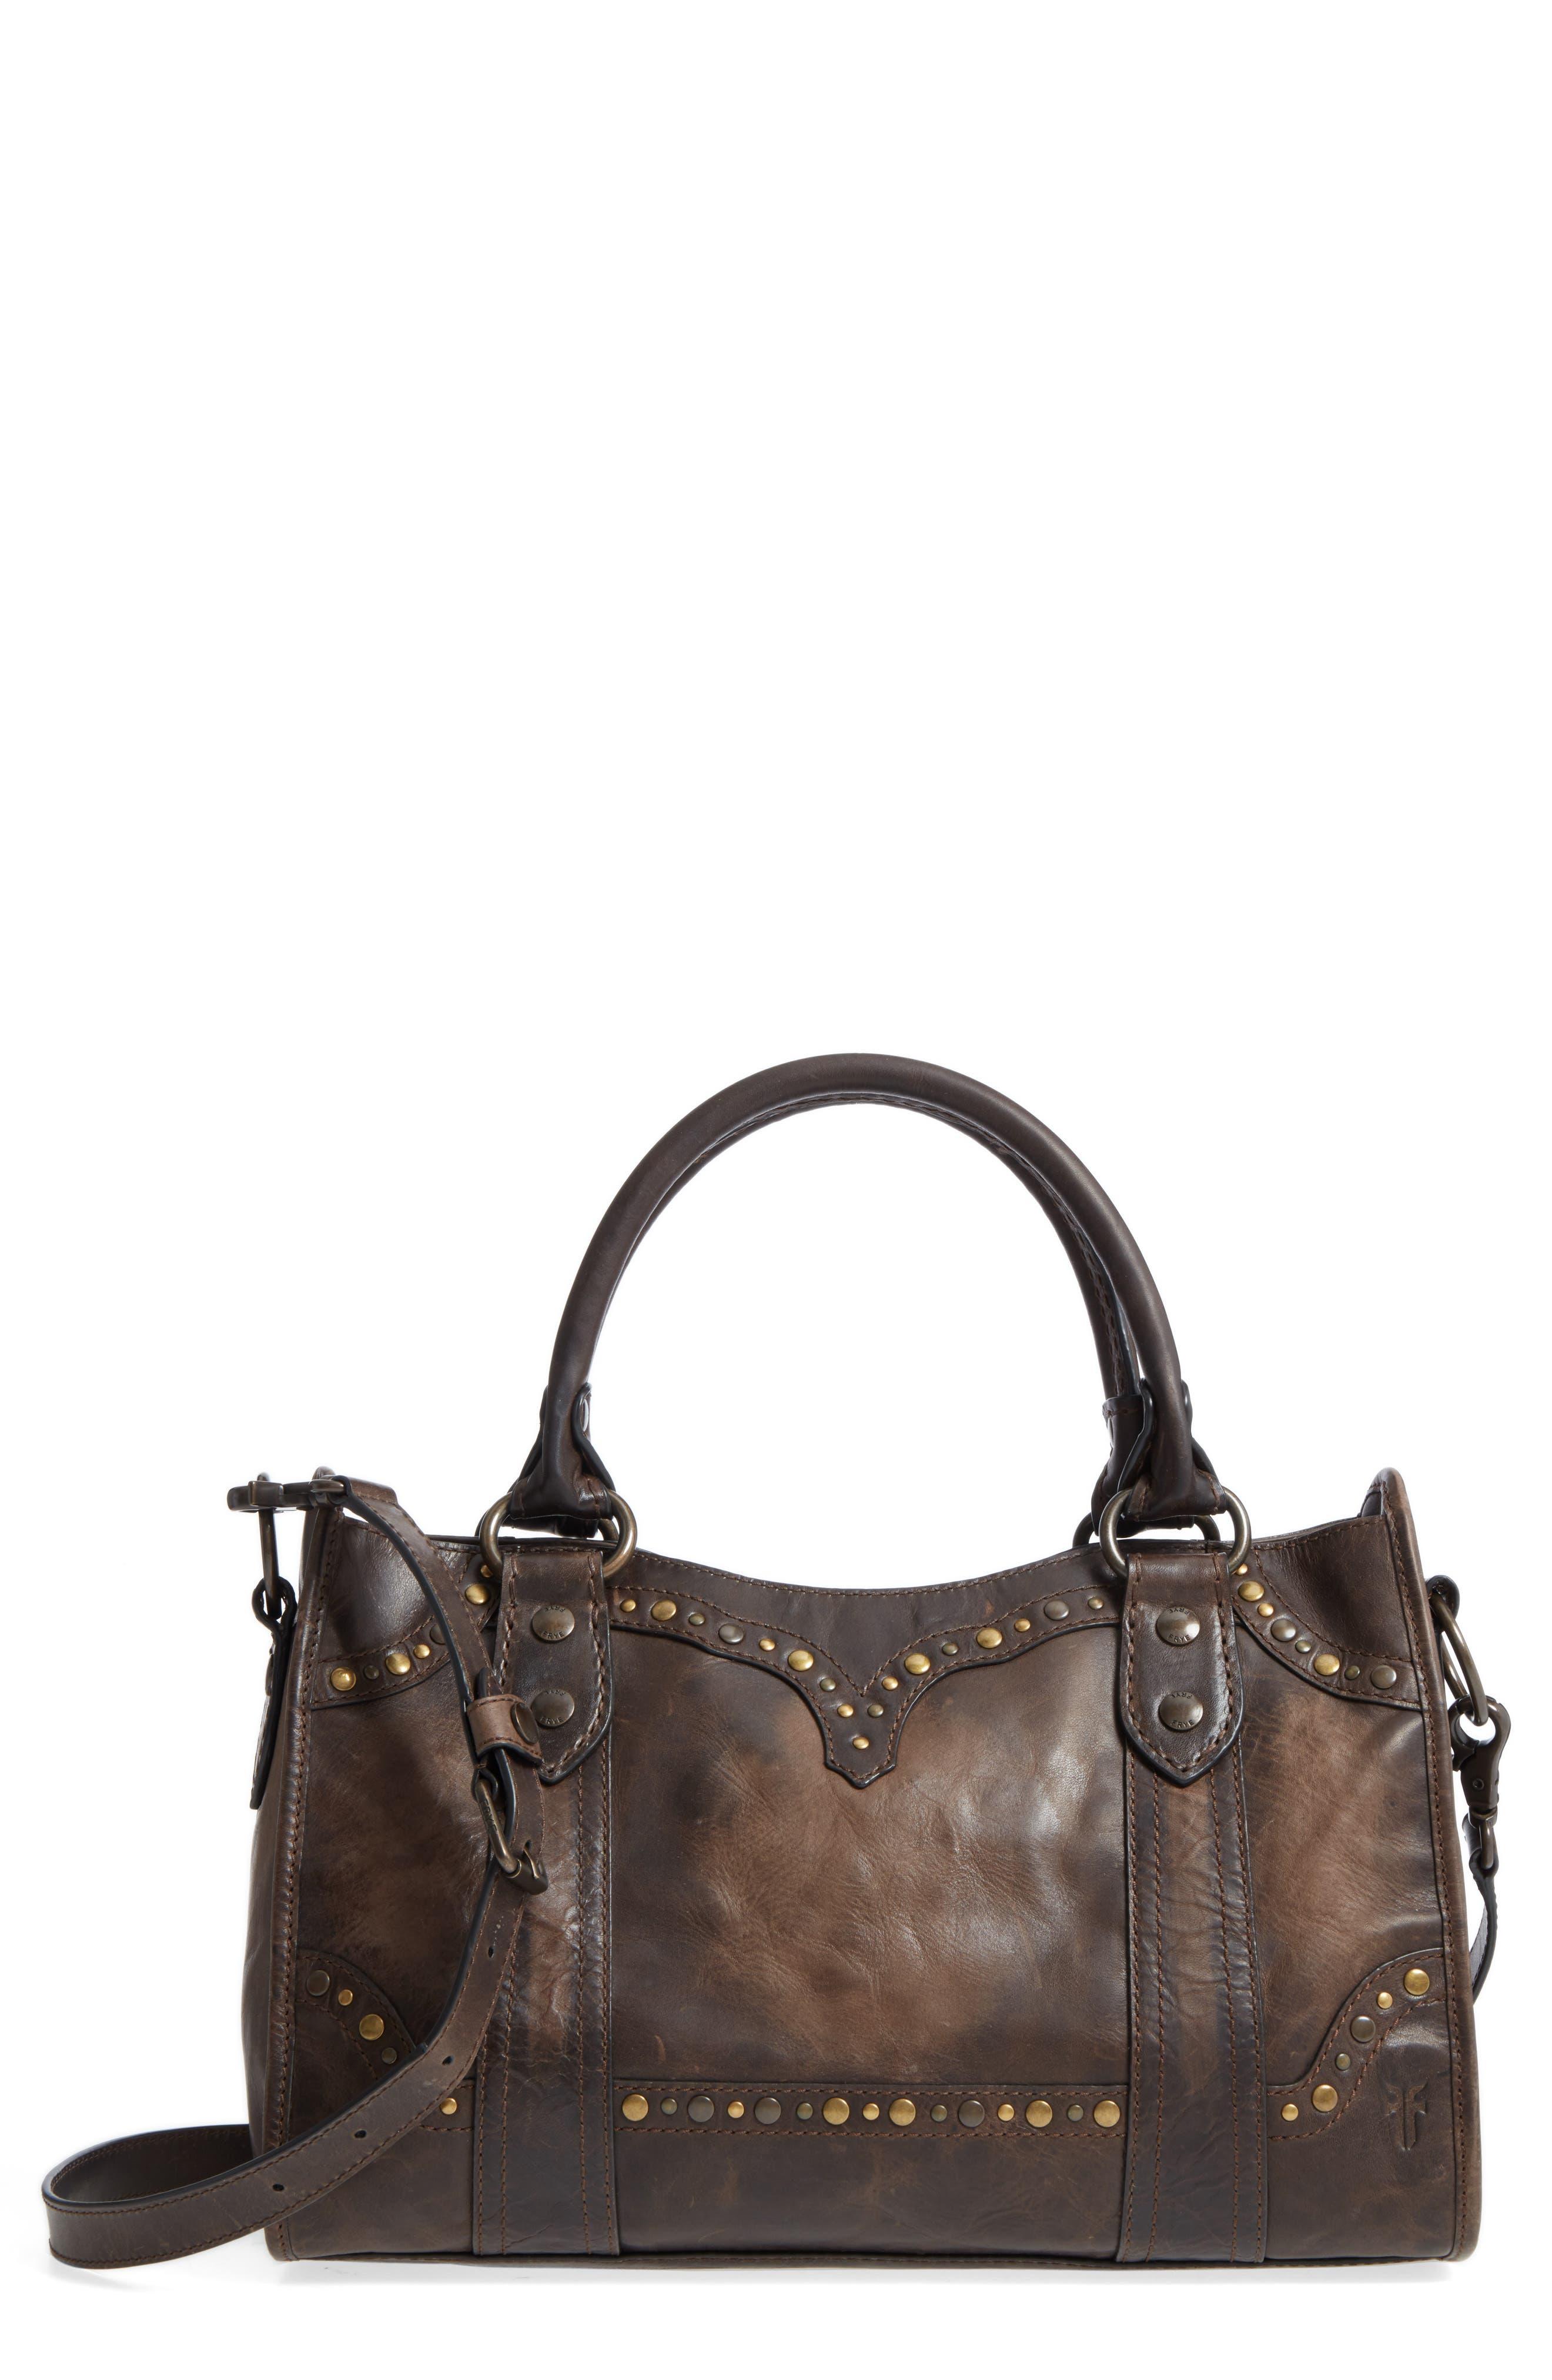 Frye Melissa Western Calfskin Leather Satchel